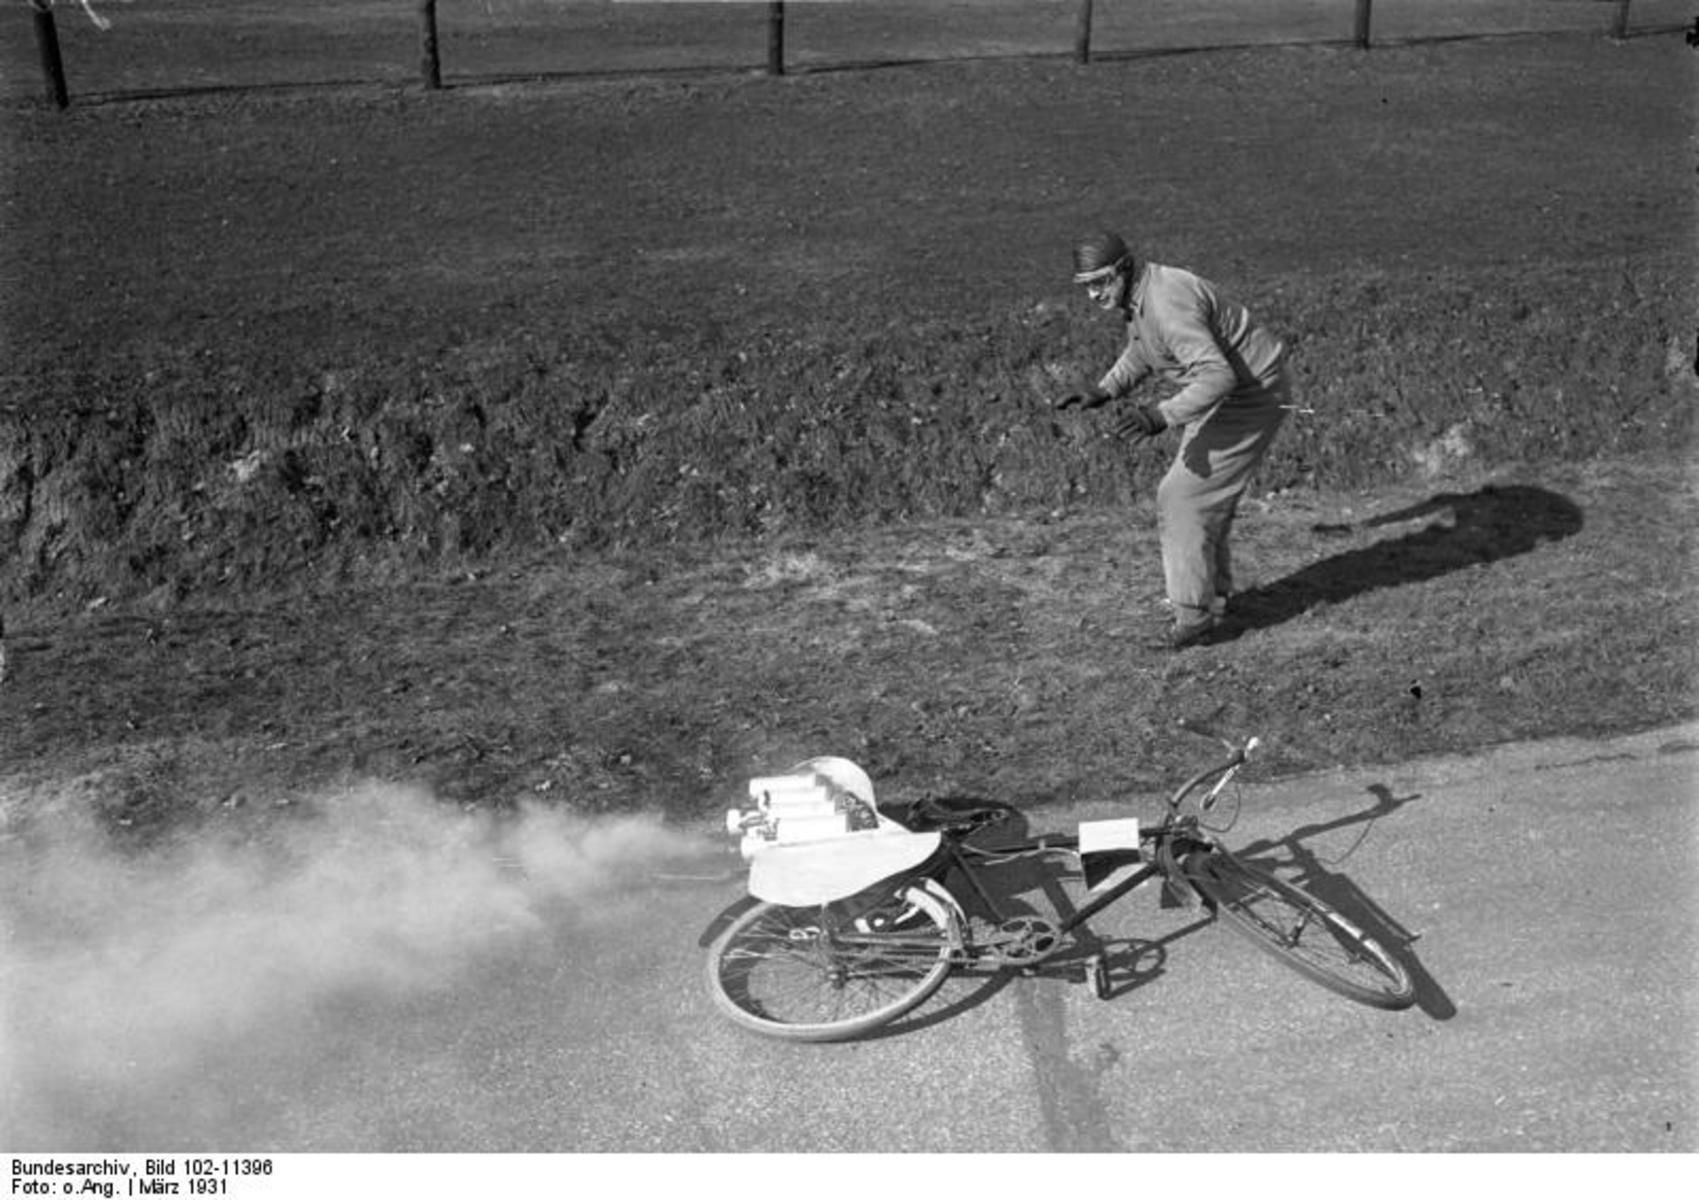 Bundesarchiv_Bild_102-11396,_Berlin,_Avus,_Fahrrad_mit_Raketenantrieb.jpg